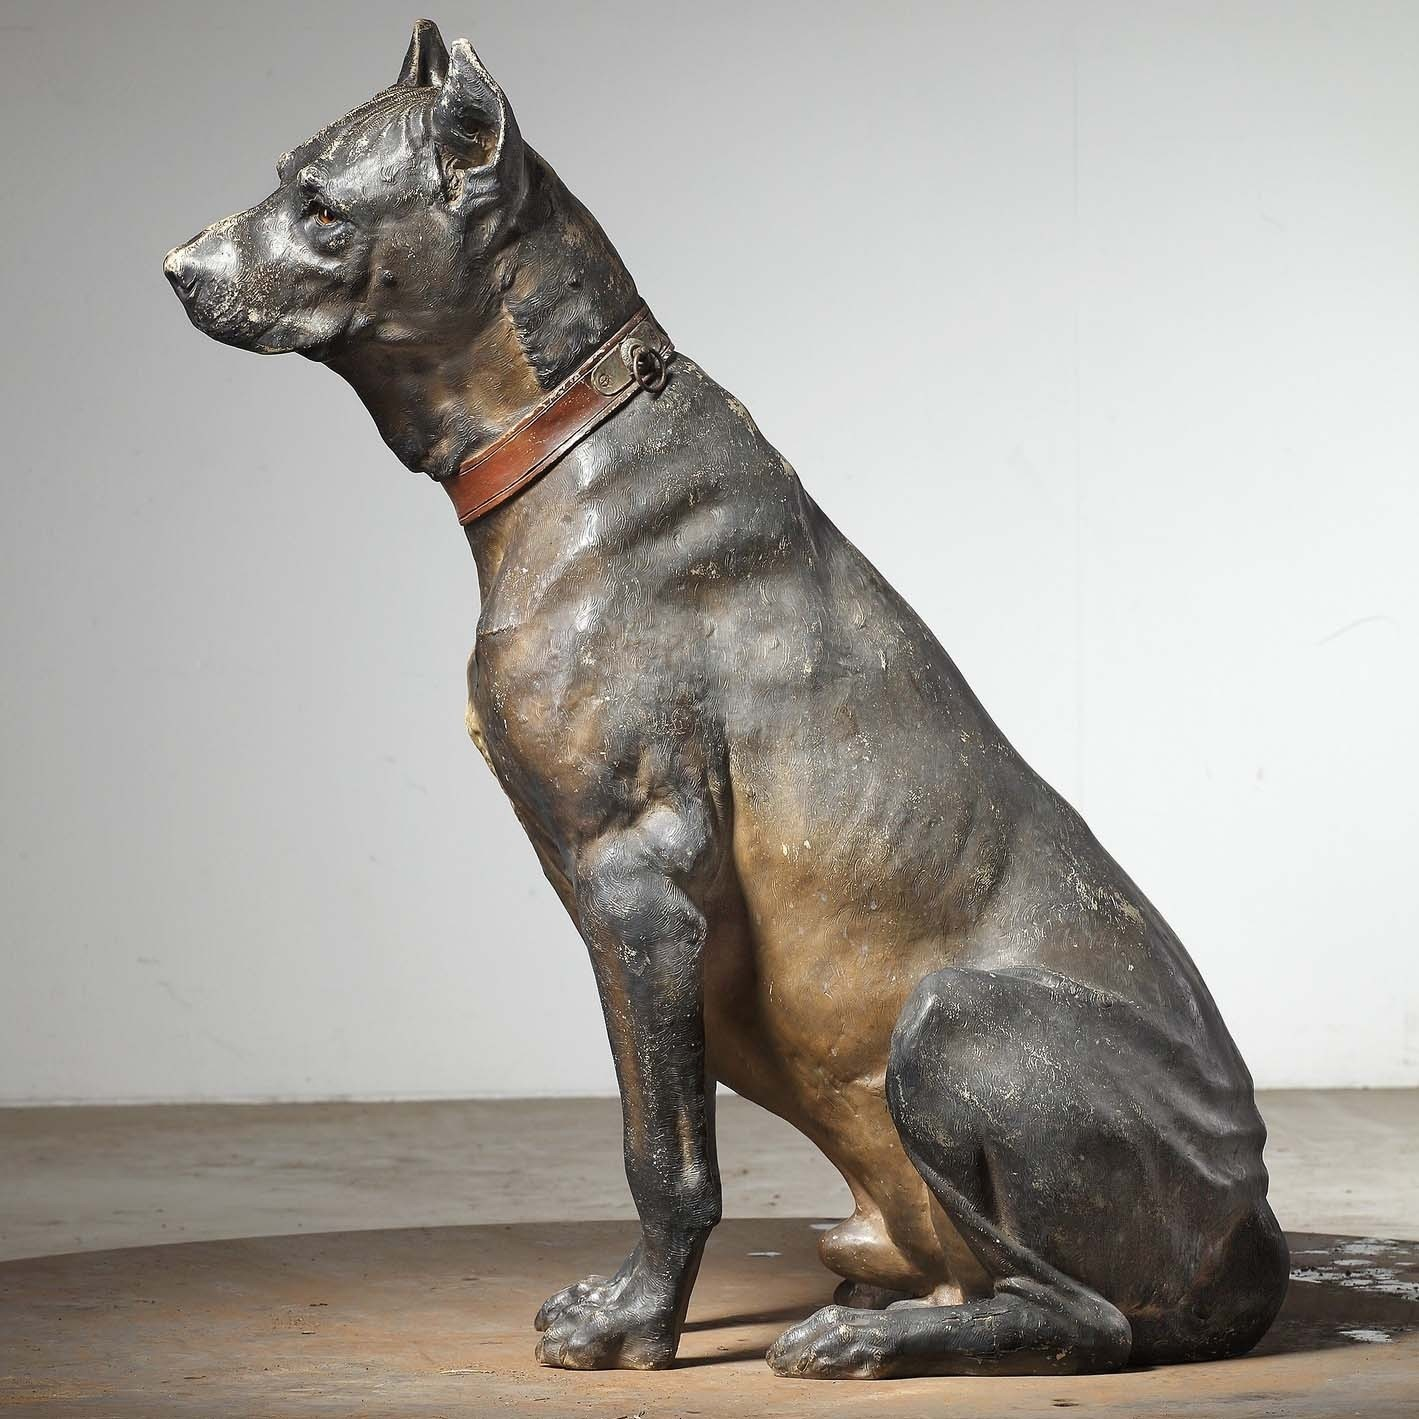 Große Terrakotta-Skulptur eines Hundes